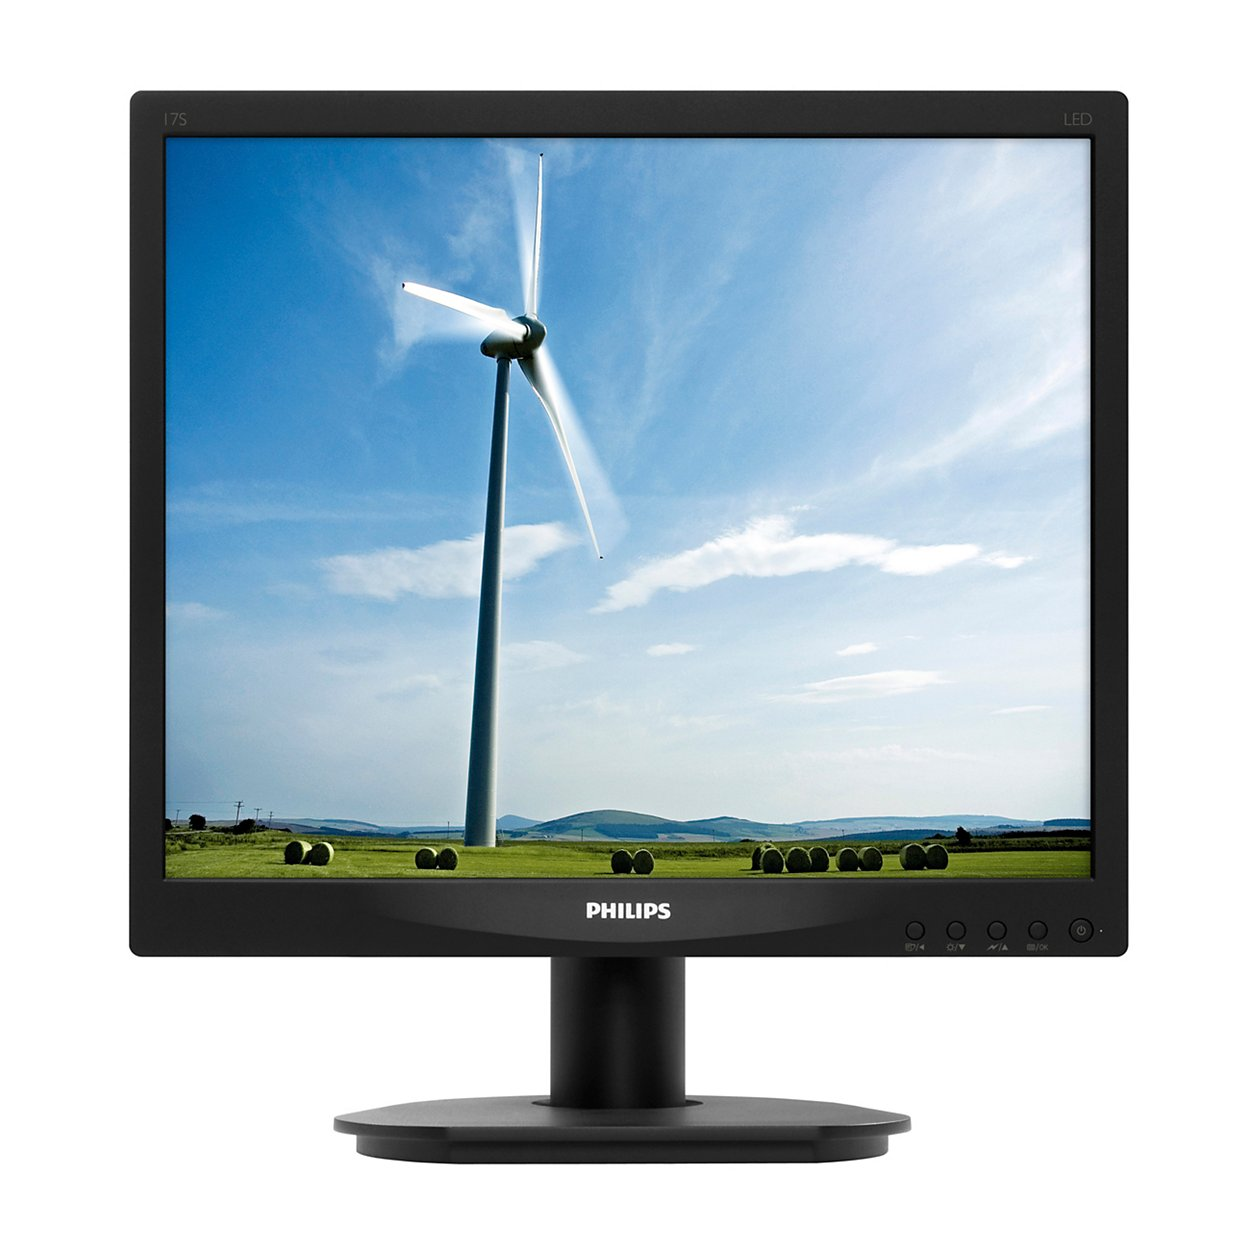 Monitor LED Philips 17S4LSB/00 17 1280x1024 SmartImage, S-Line, Black